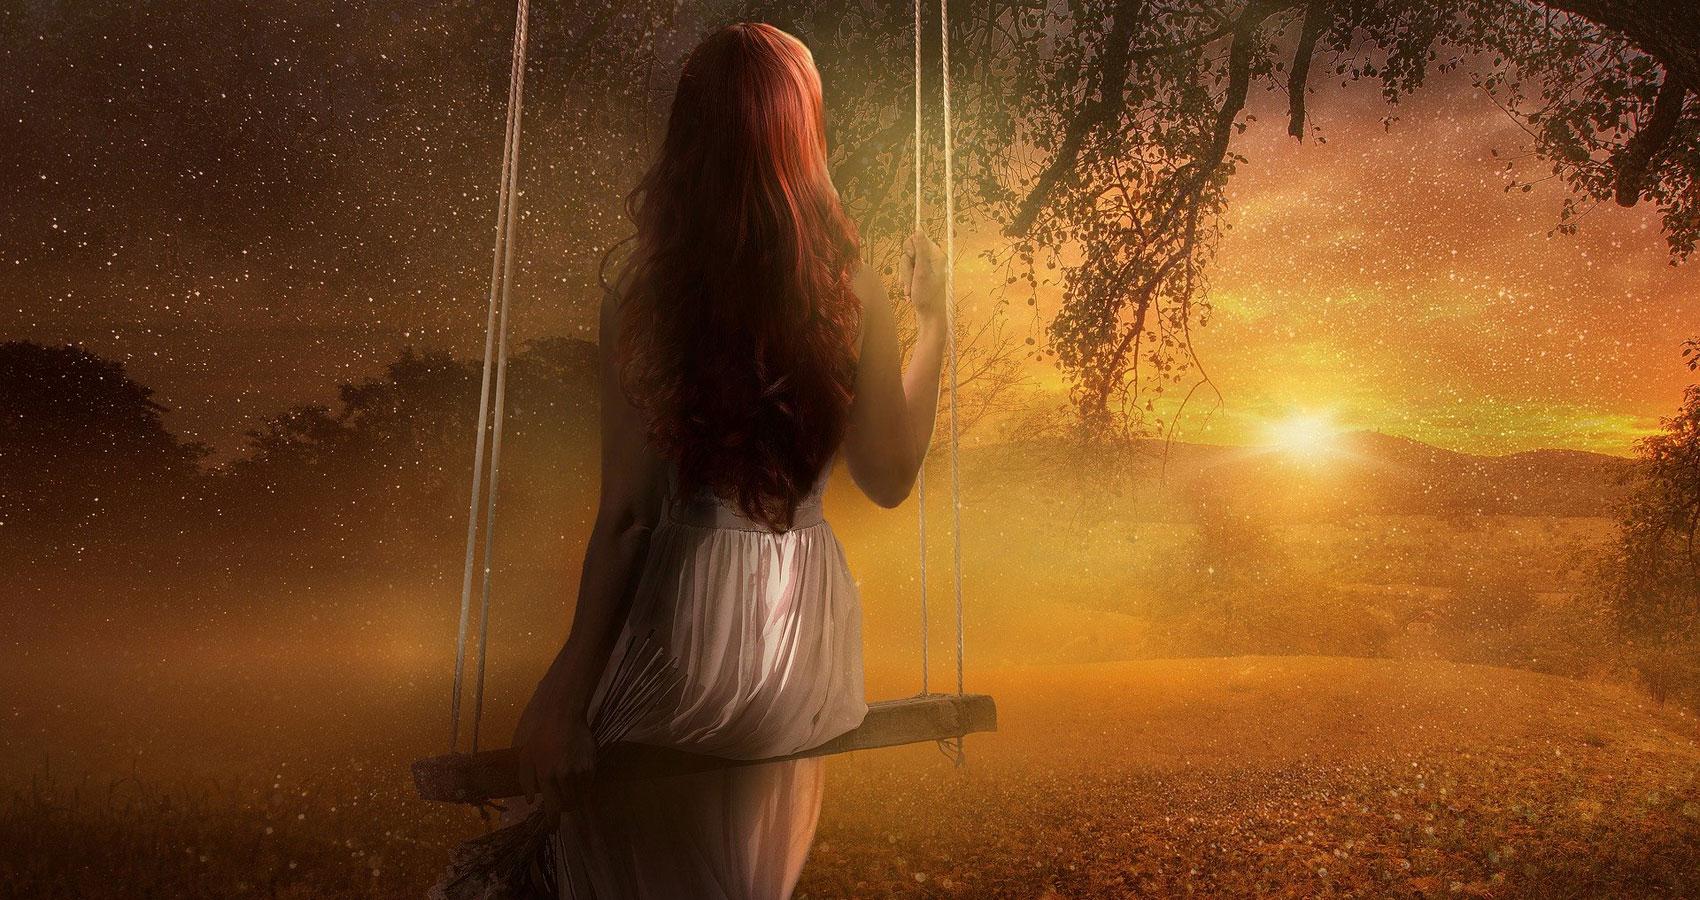 A Dark Fairy Tale, a poem written by Yasmin Hemmat at Spillwords.com